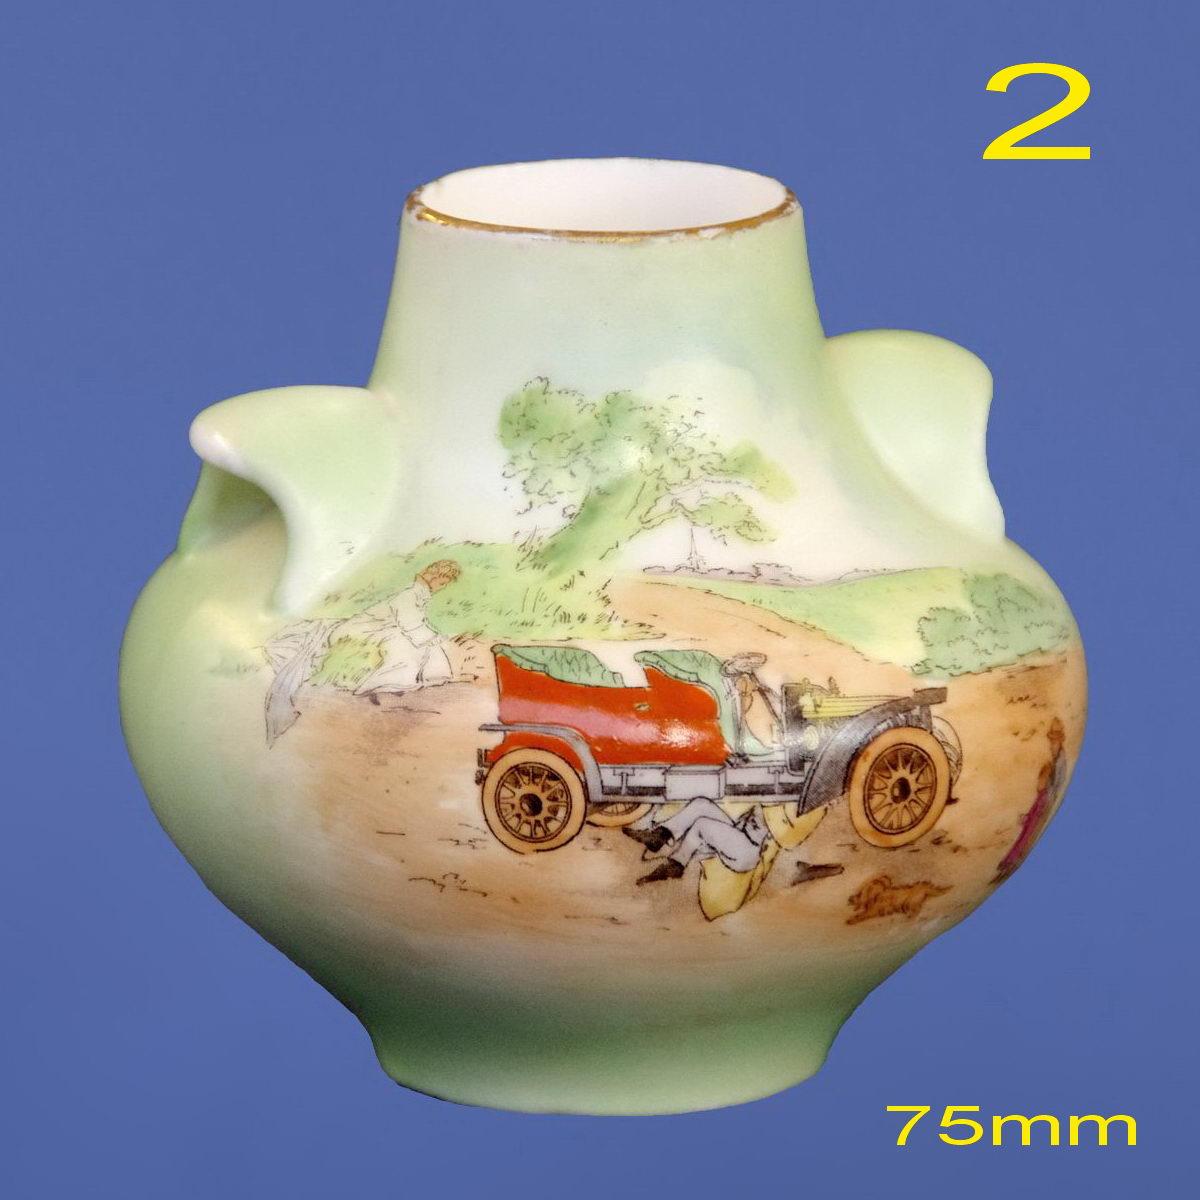 Shape 2 of Small China Vase Series